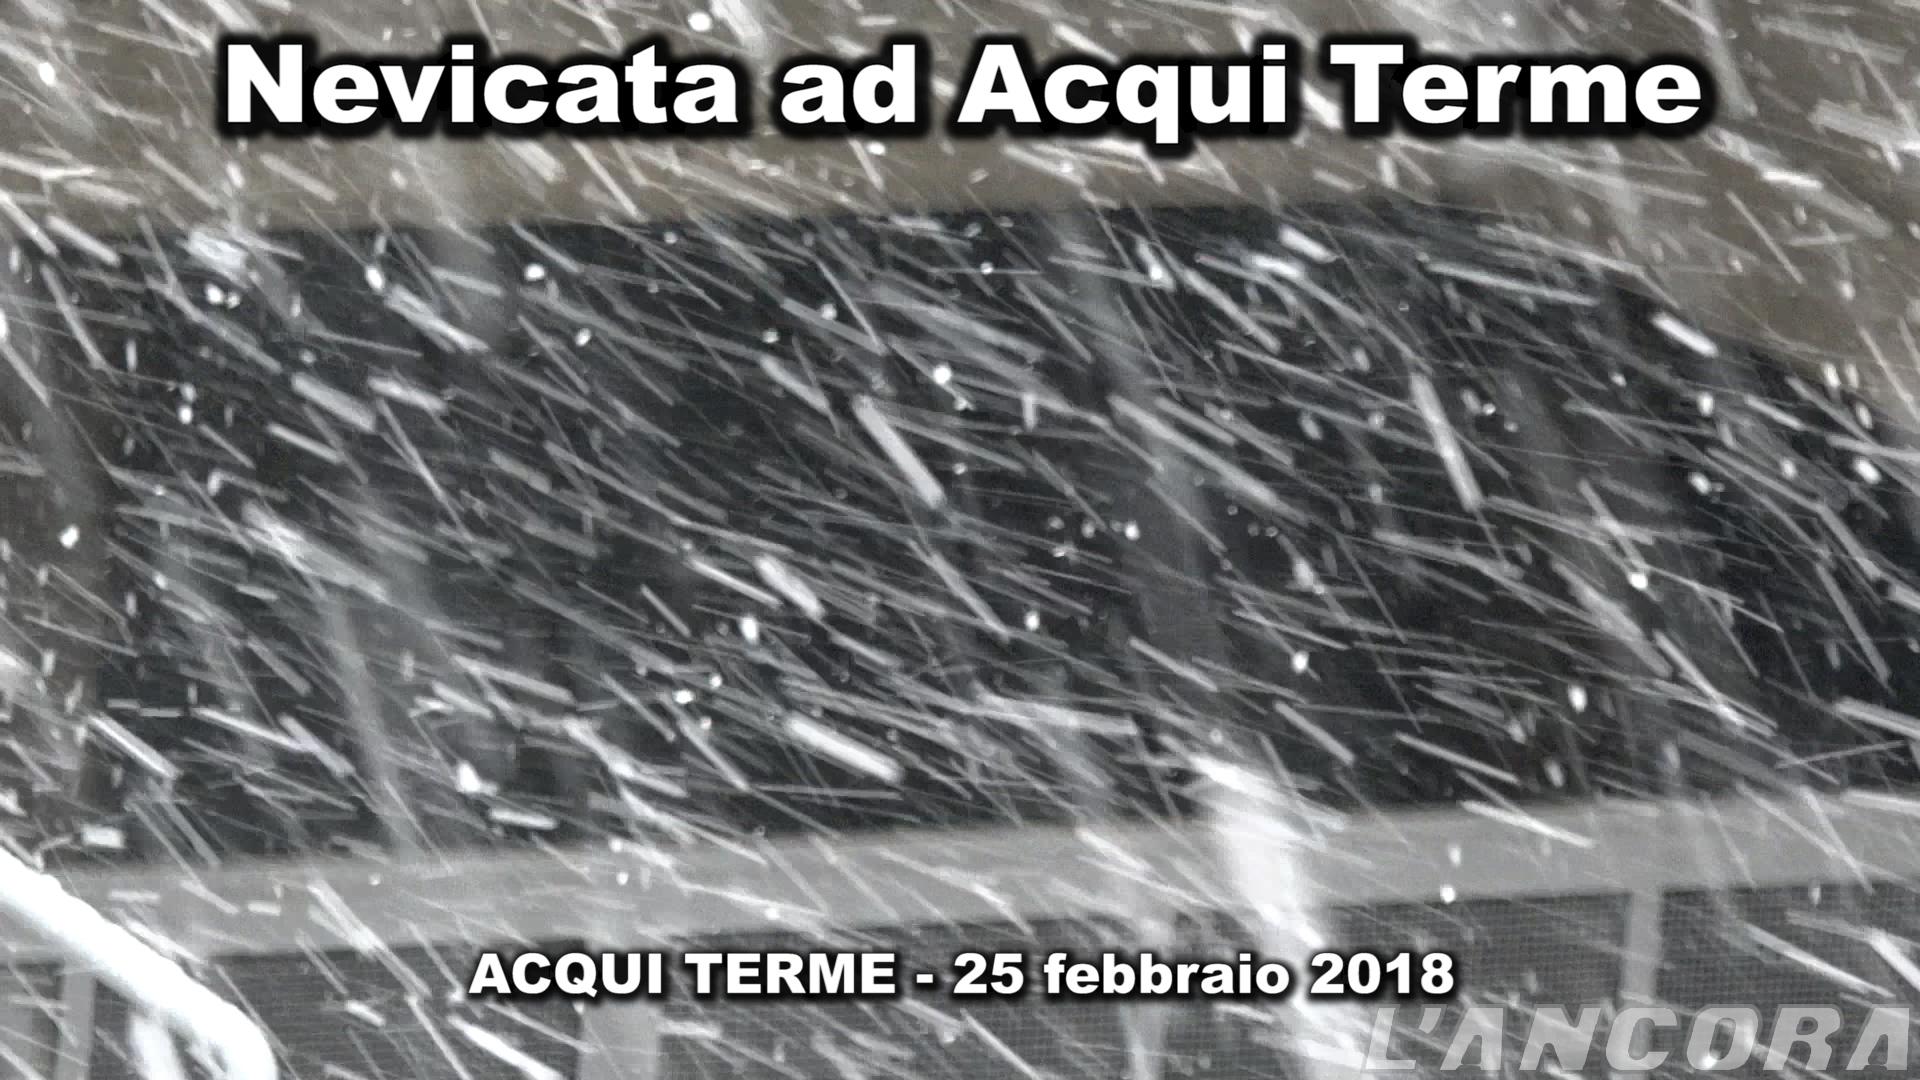 video_2018-02-25_nevicata_imm